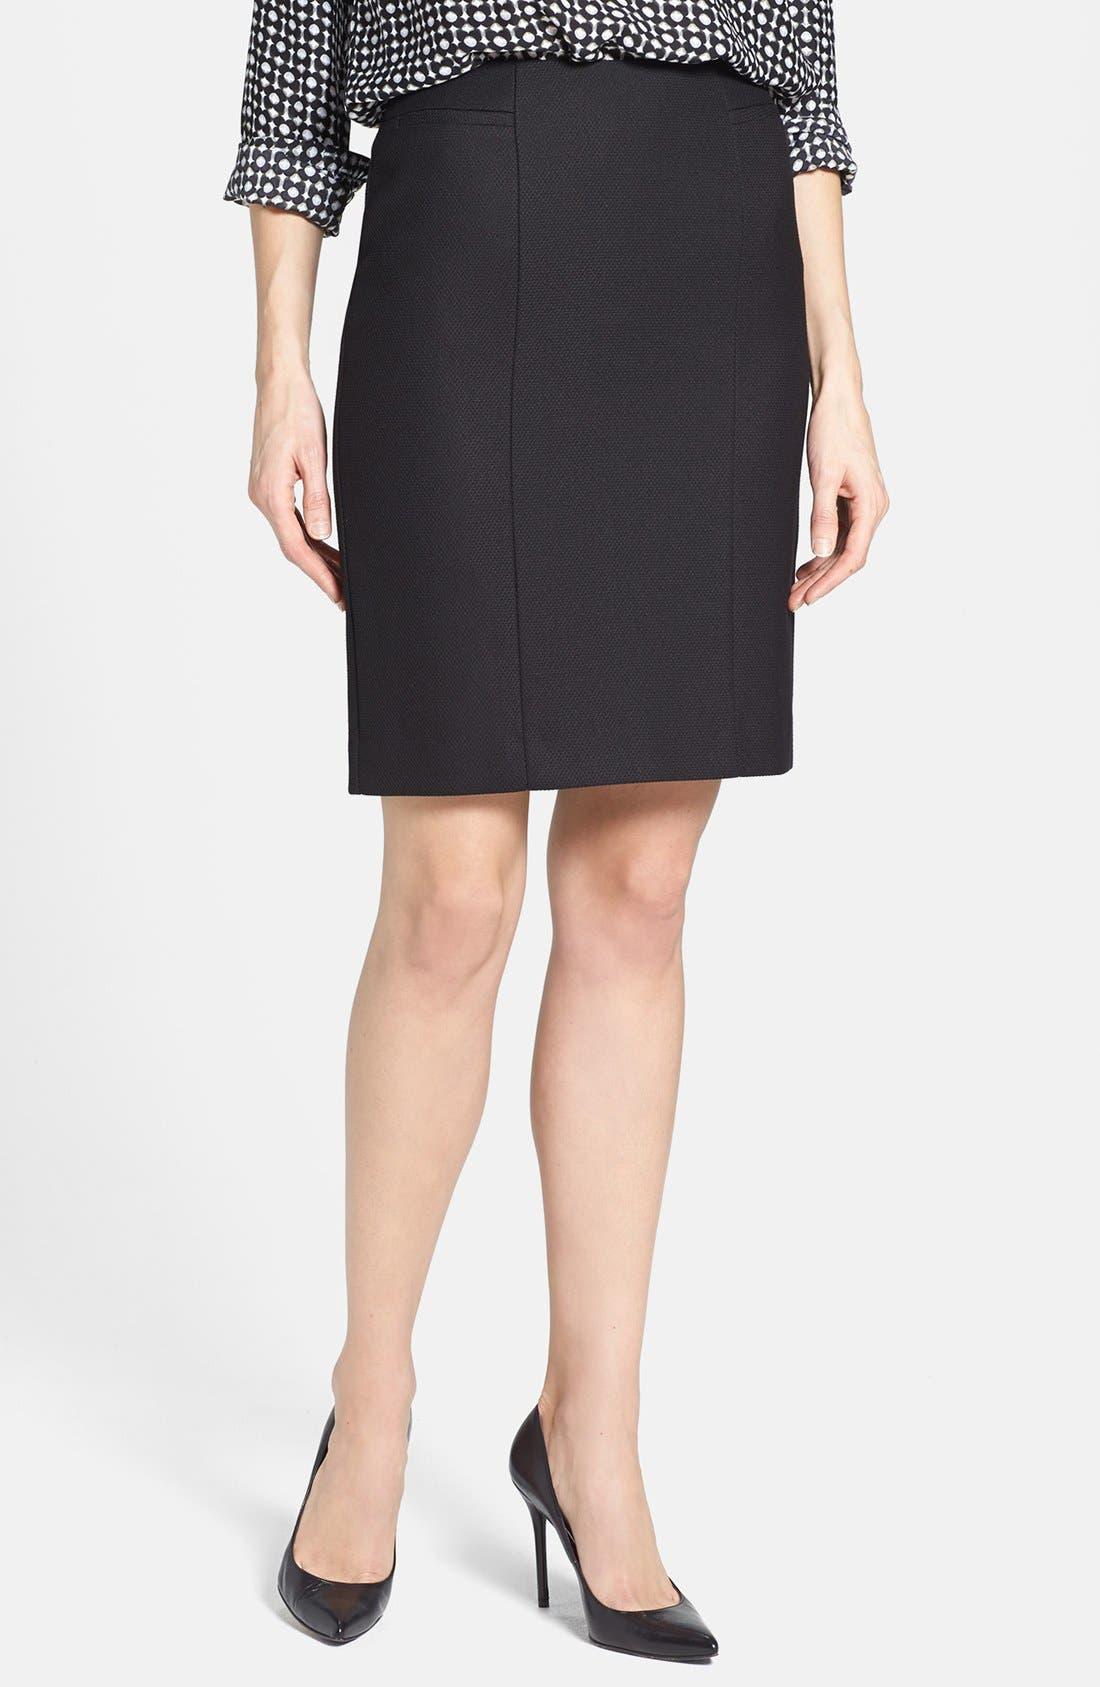 Alternate Image 1 Selected - Halogen® Diamond Stretch Suit Skirt (Petite)